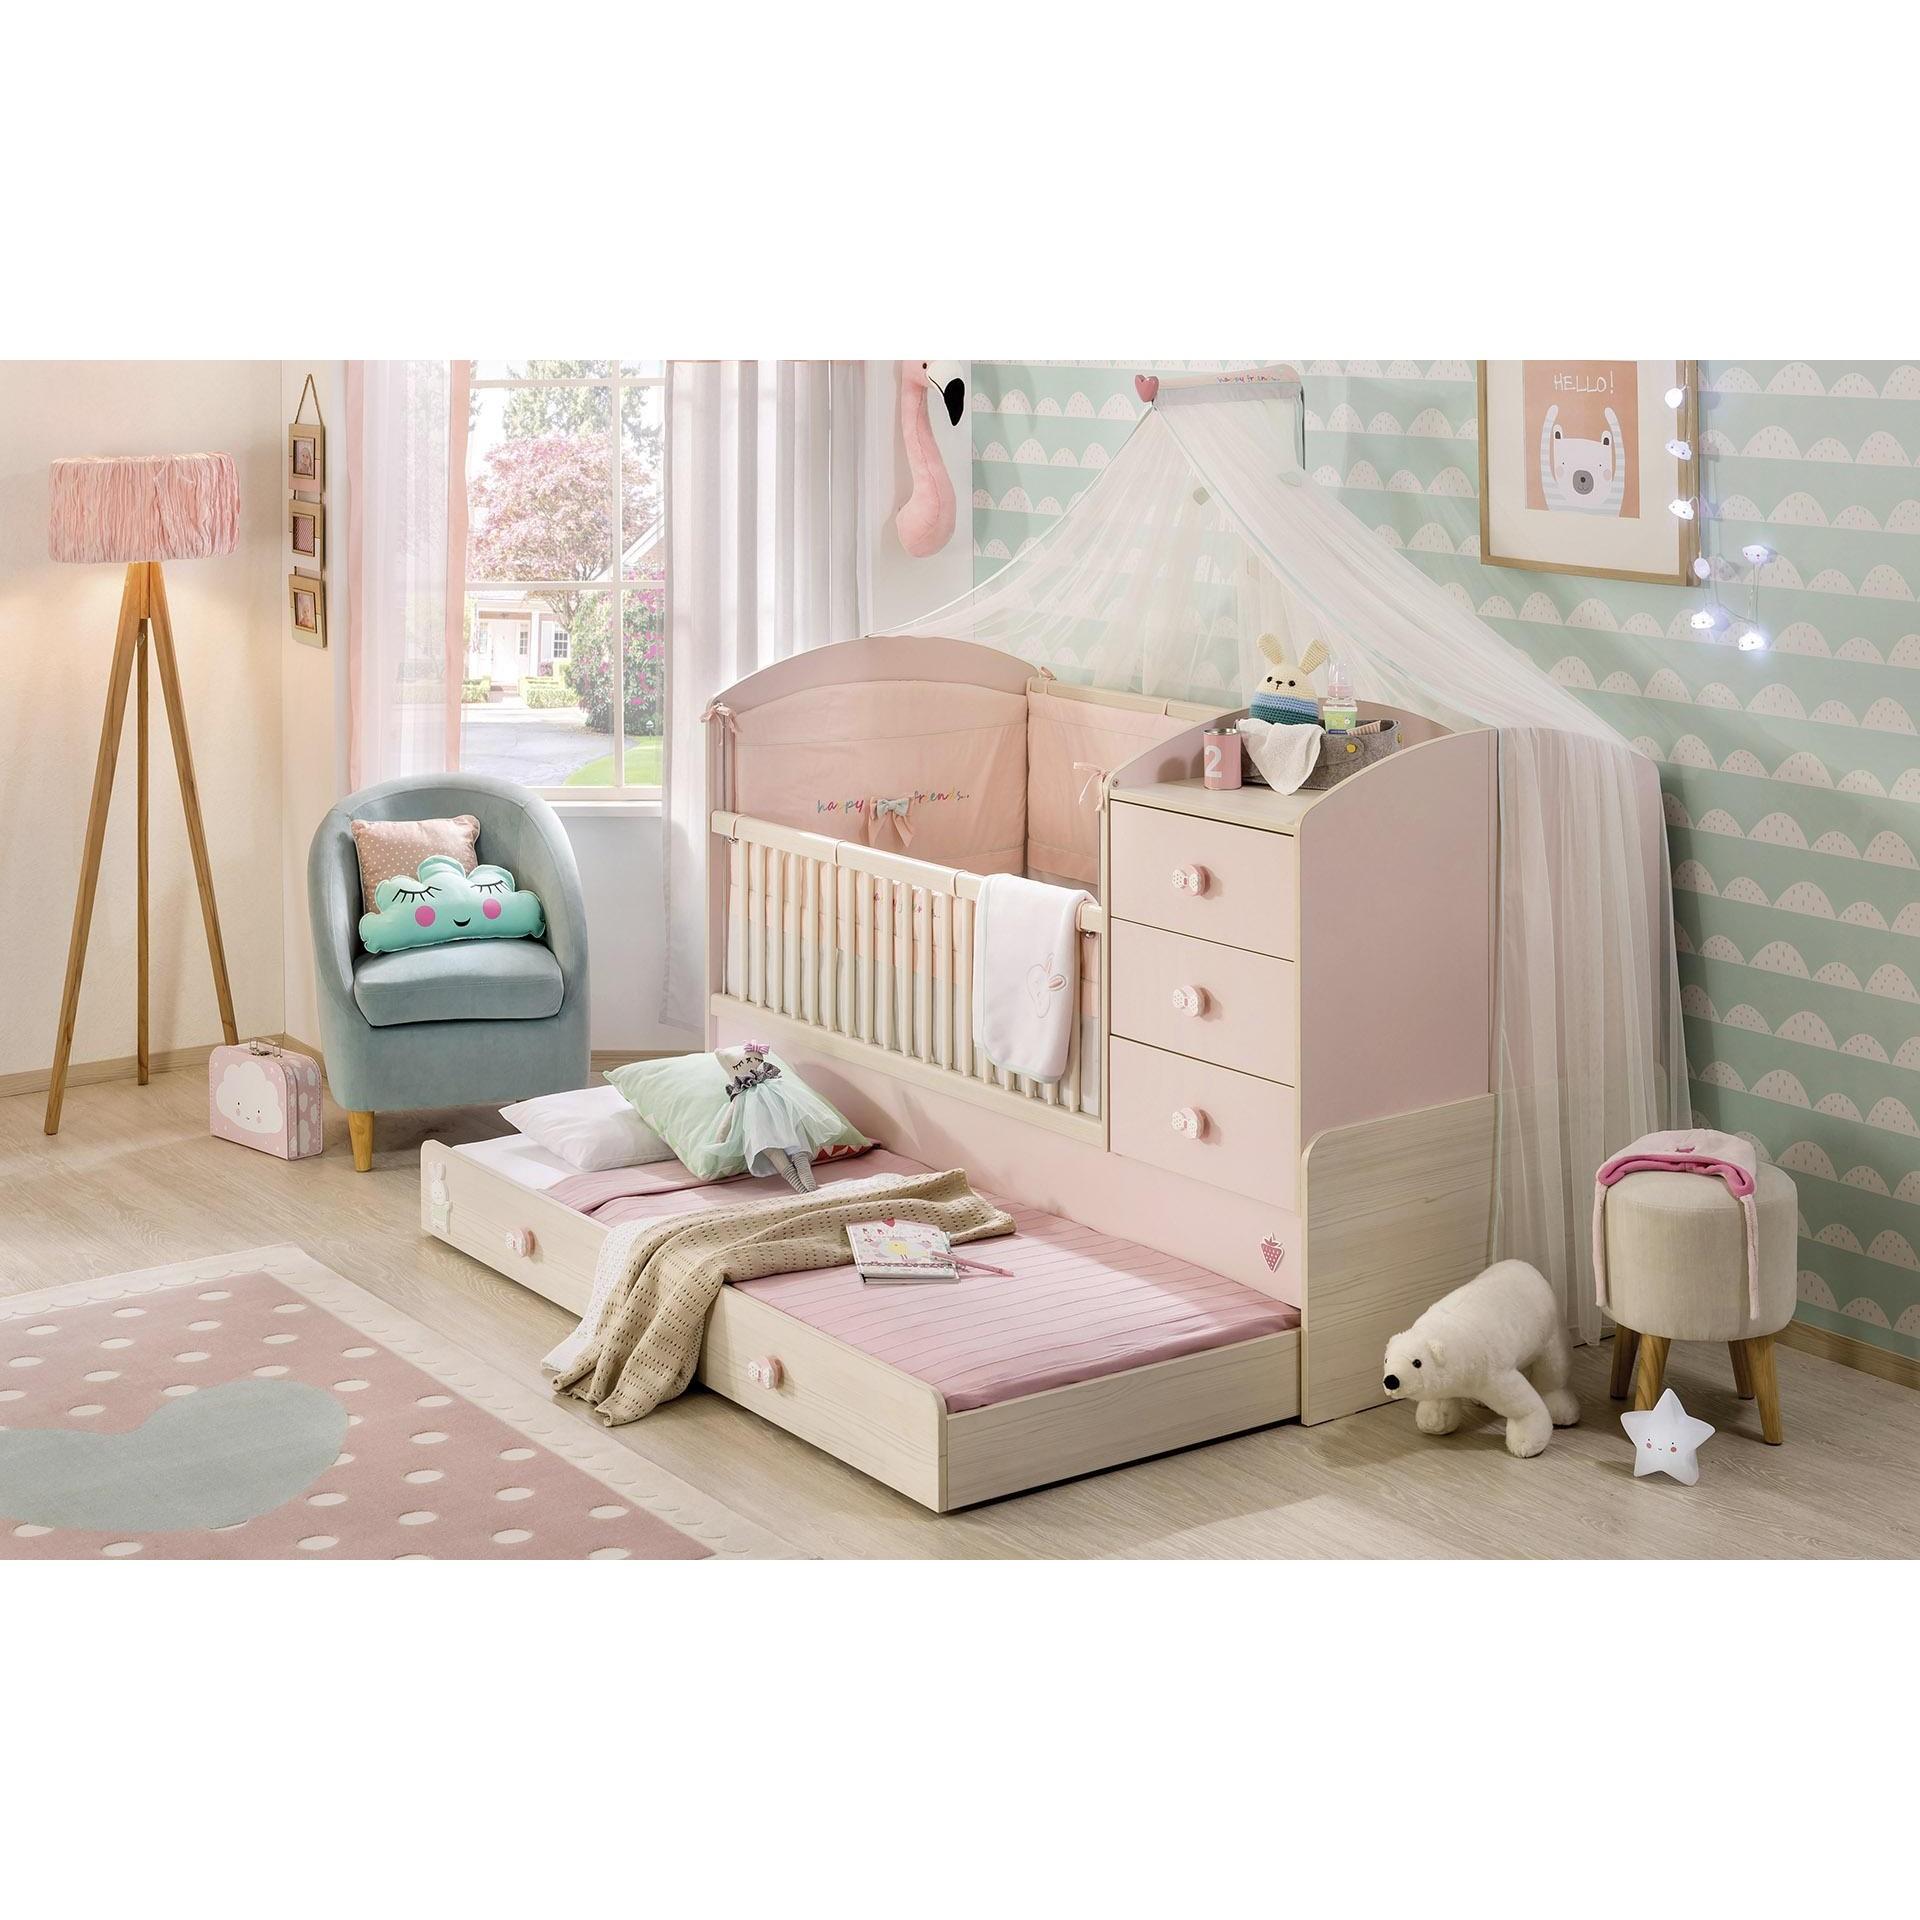 Baby En Peuterbed.Babykamer Roze Babybed Ledikant Meegroeibed 4 In 1 Kinderkamer